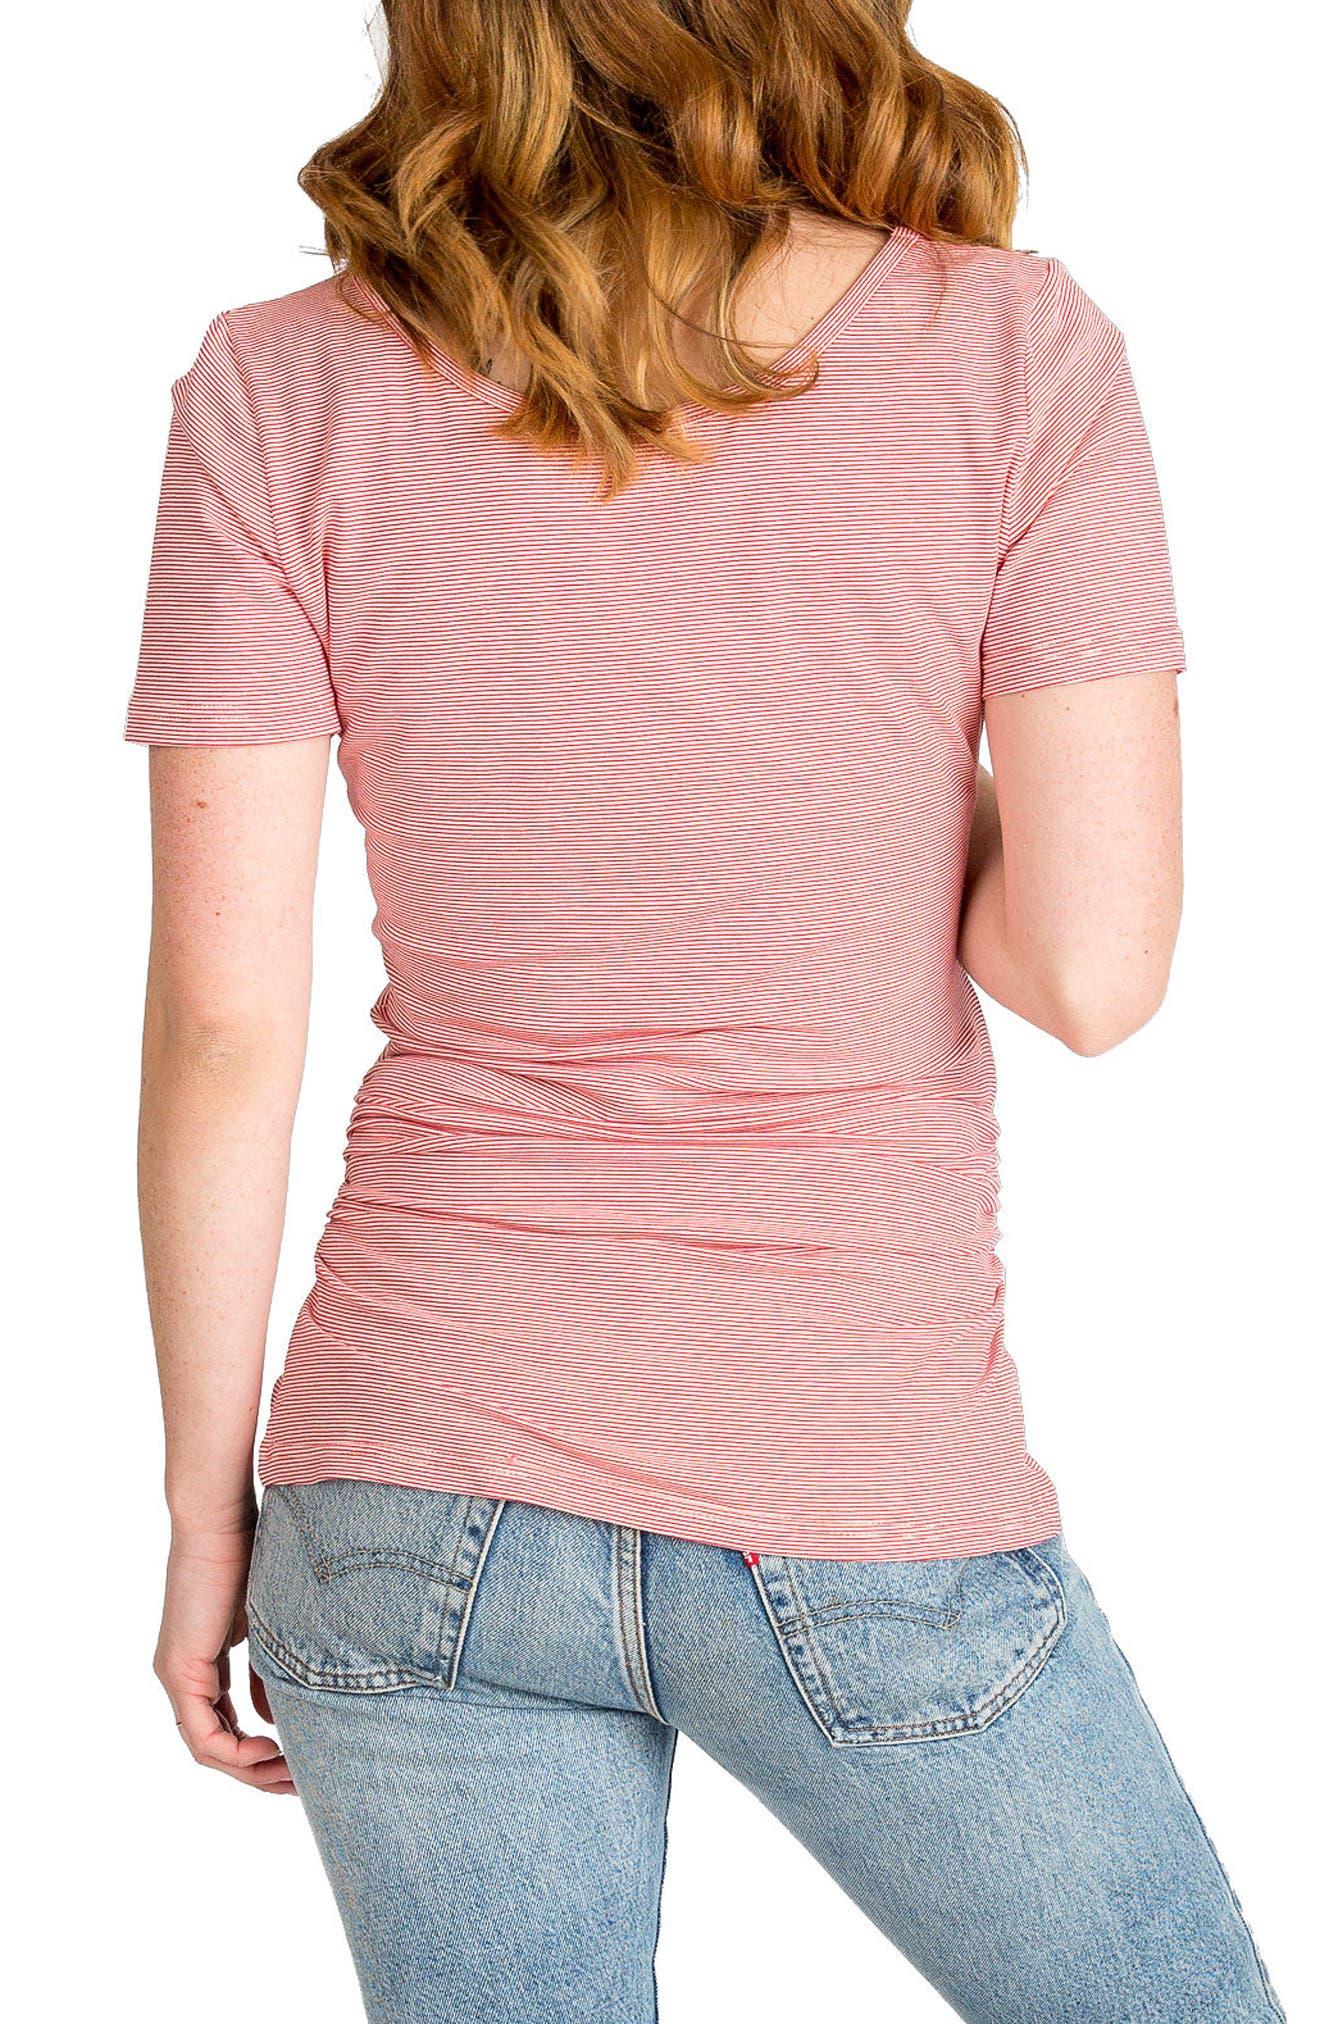 Alternate Image 2  - Nom Maternity 'Tate' Stripe Maternity Top